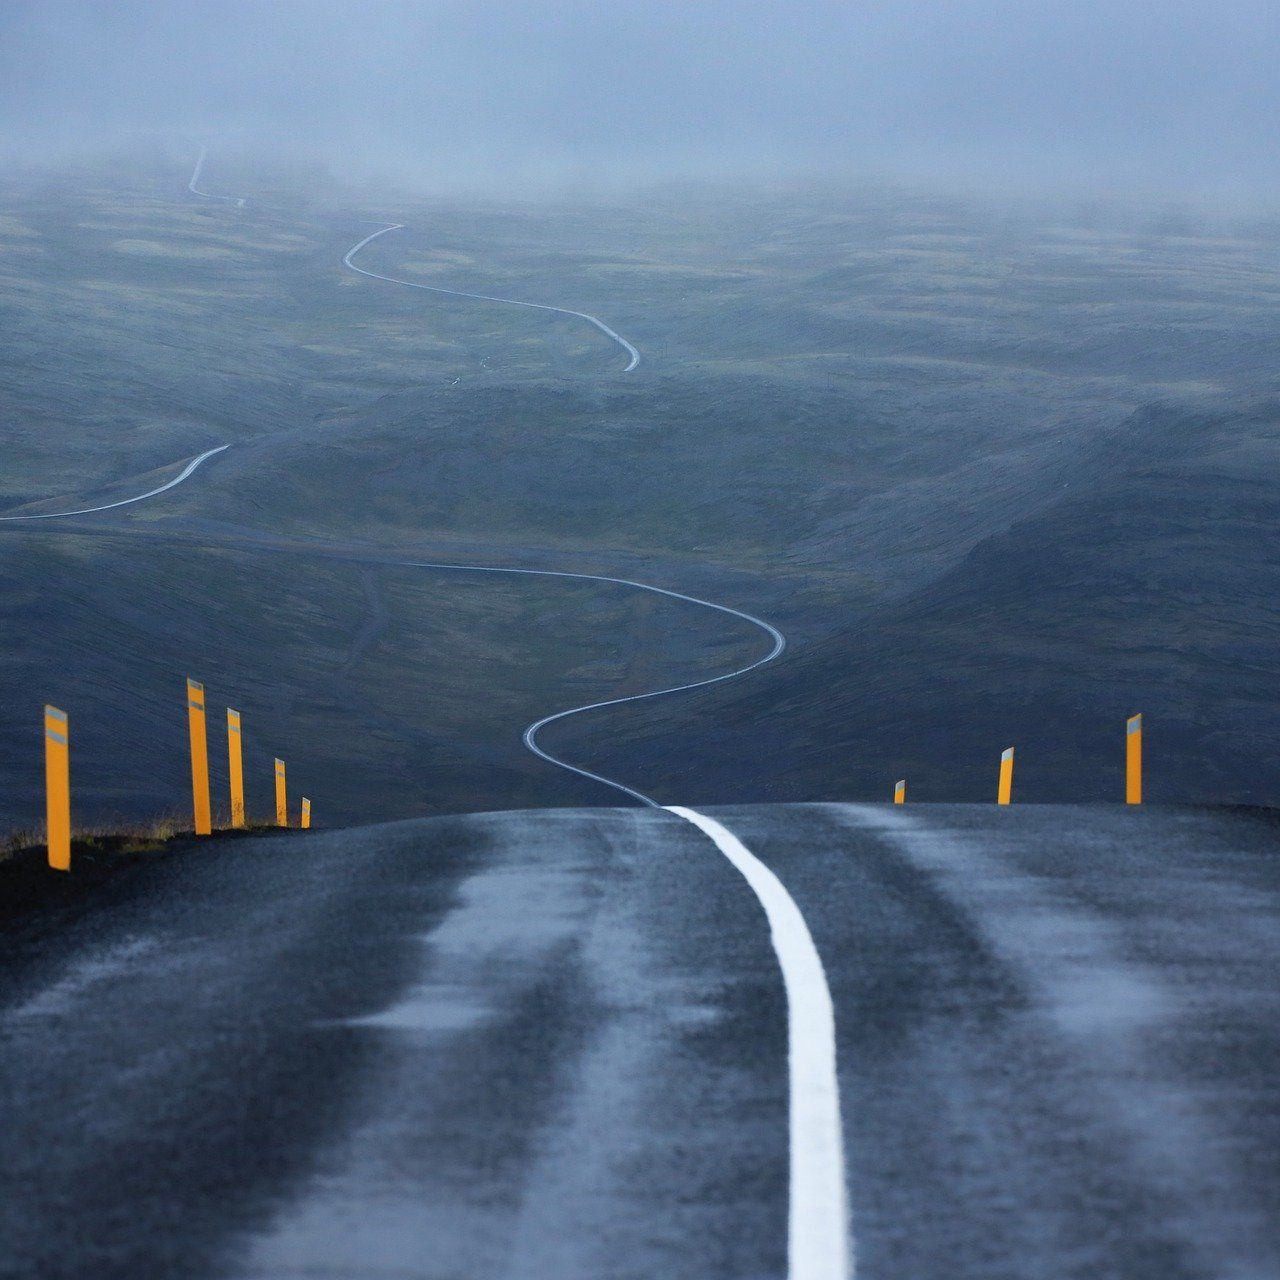 road-6175186_1920